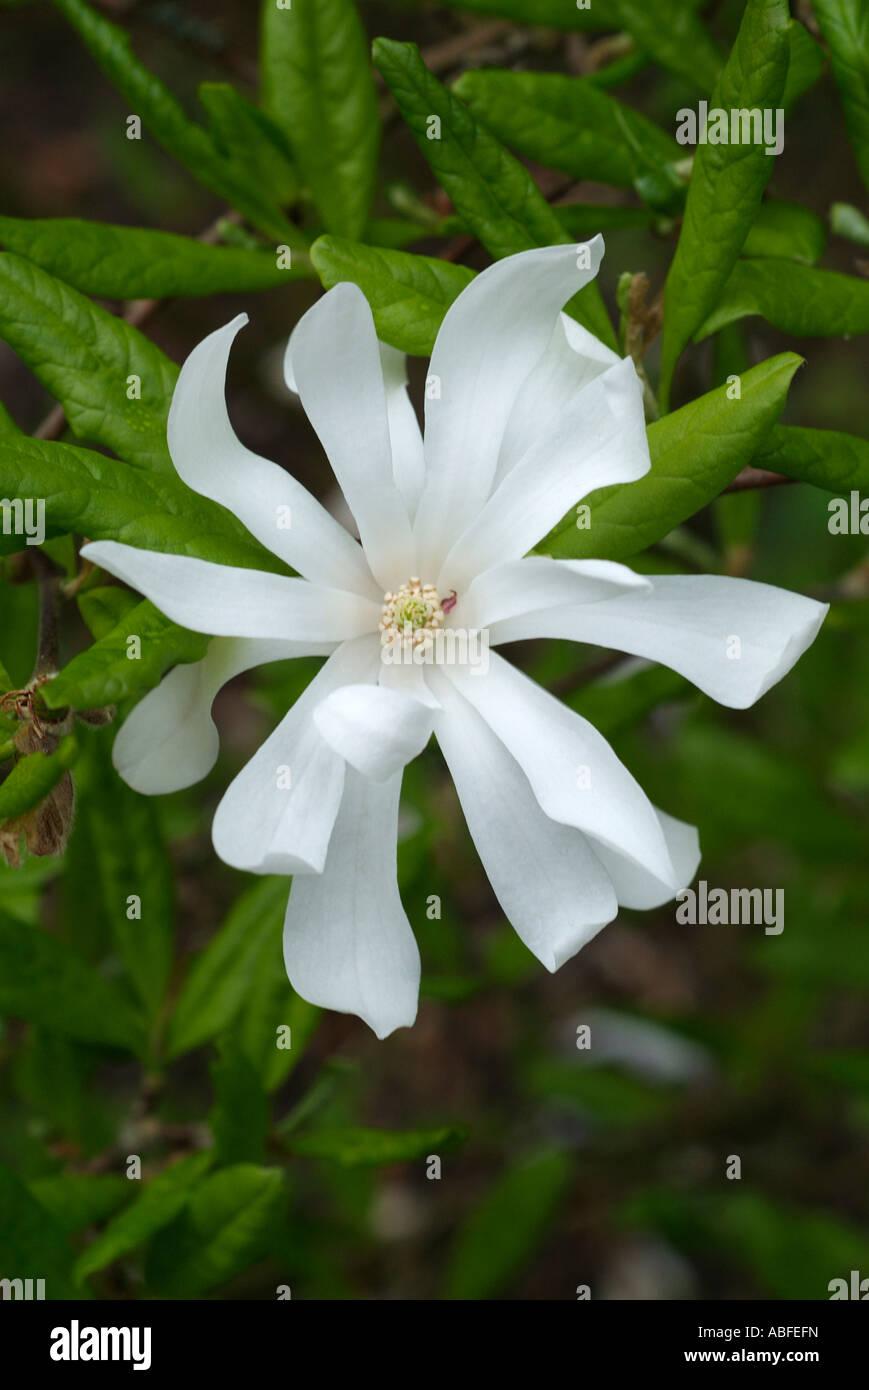 magnolia stelata tree shrub wood woody white star flower spring flowering flower petal elongated blossom bloom Stock Photo